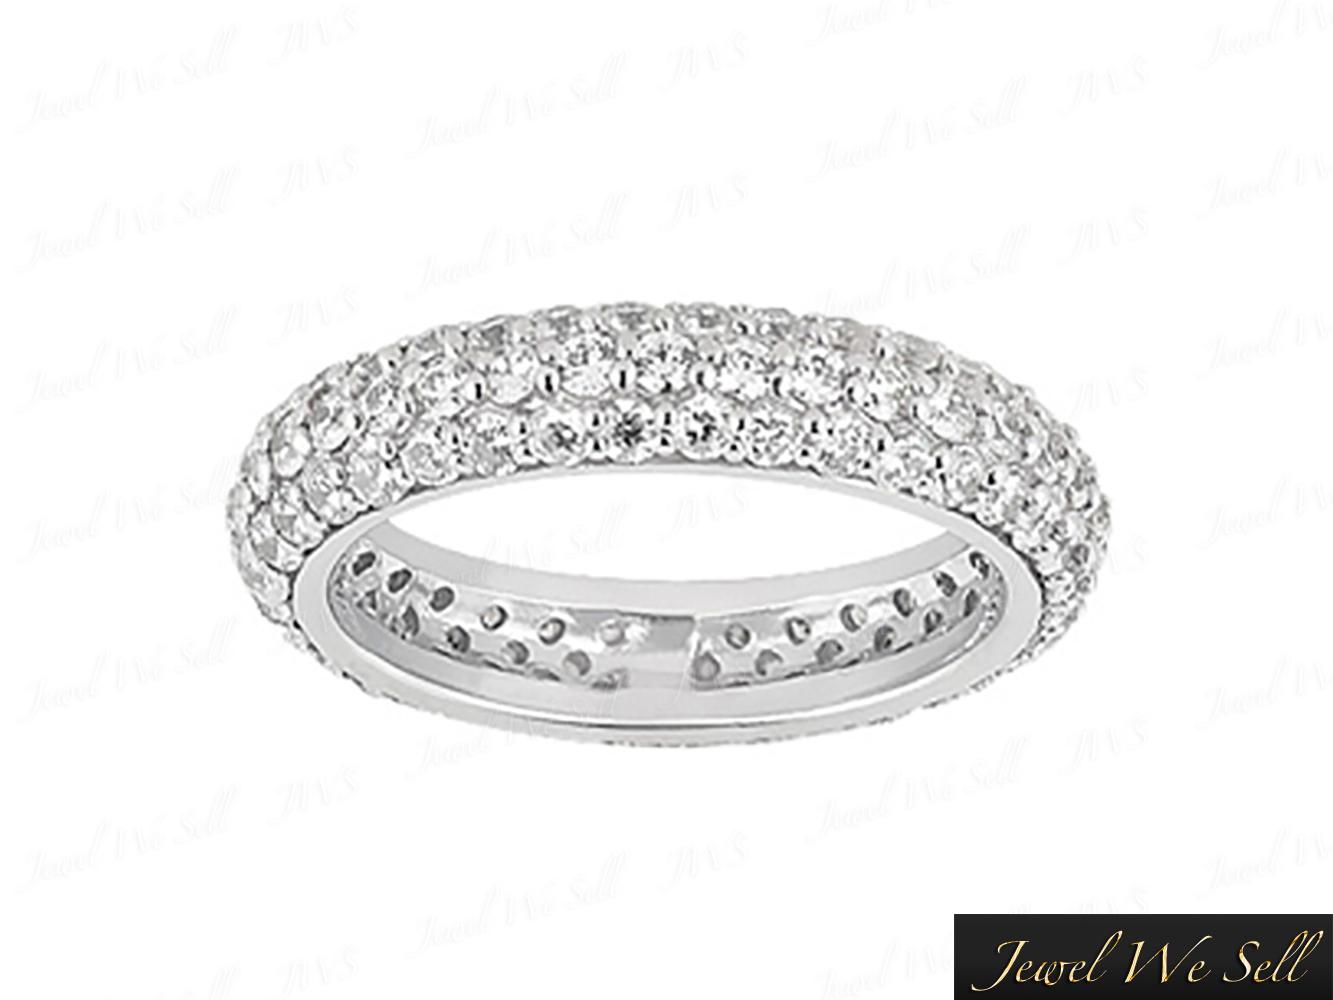 4b7b1dd6951 1.75Ct Round Cut Diamond 3 Row Pave Eternity Band Wedding Ring 14K Gold H  SI2